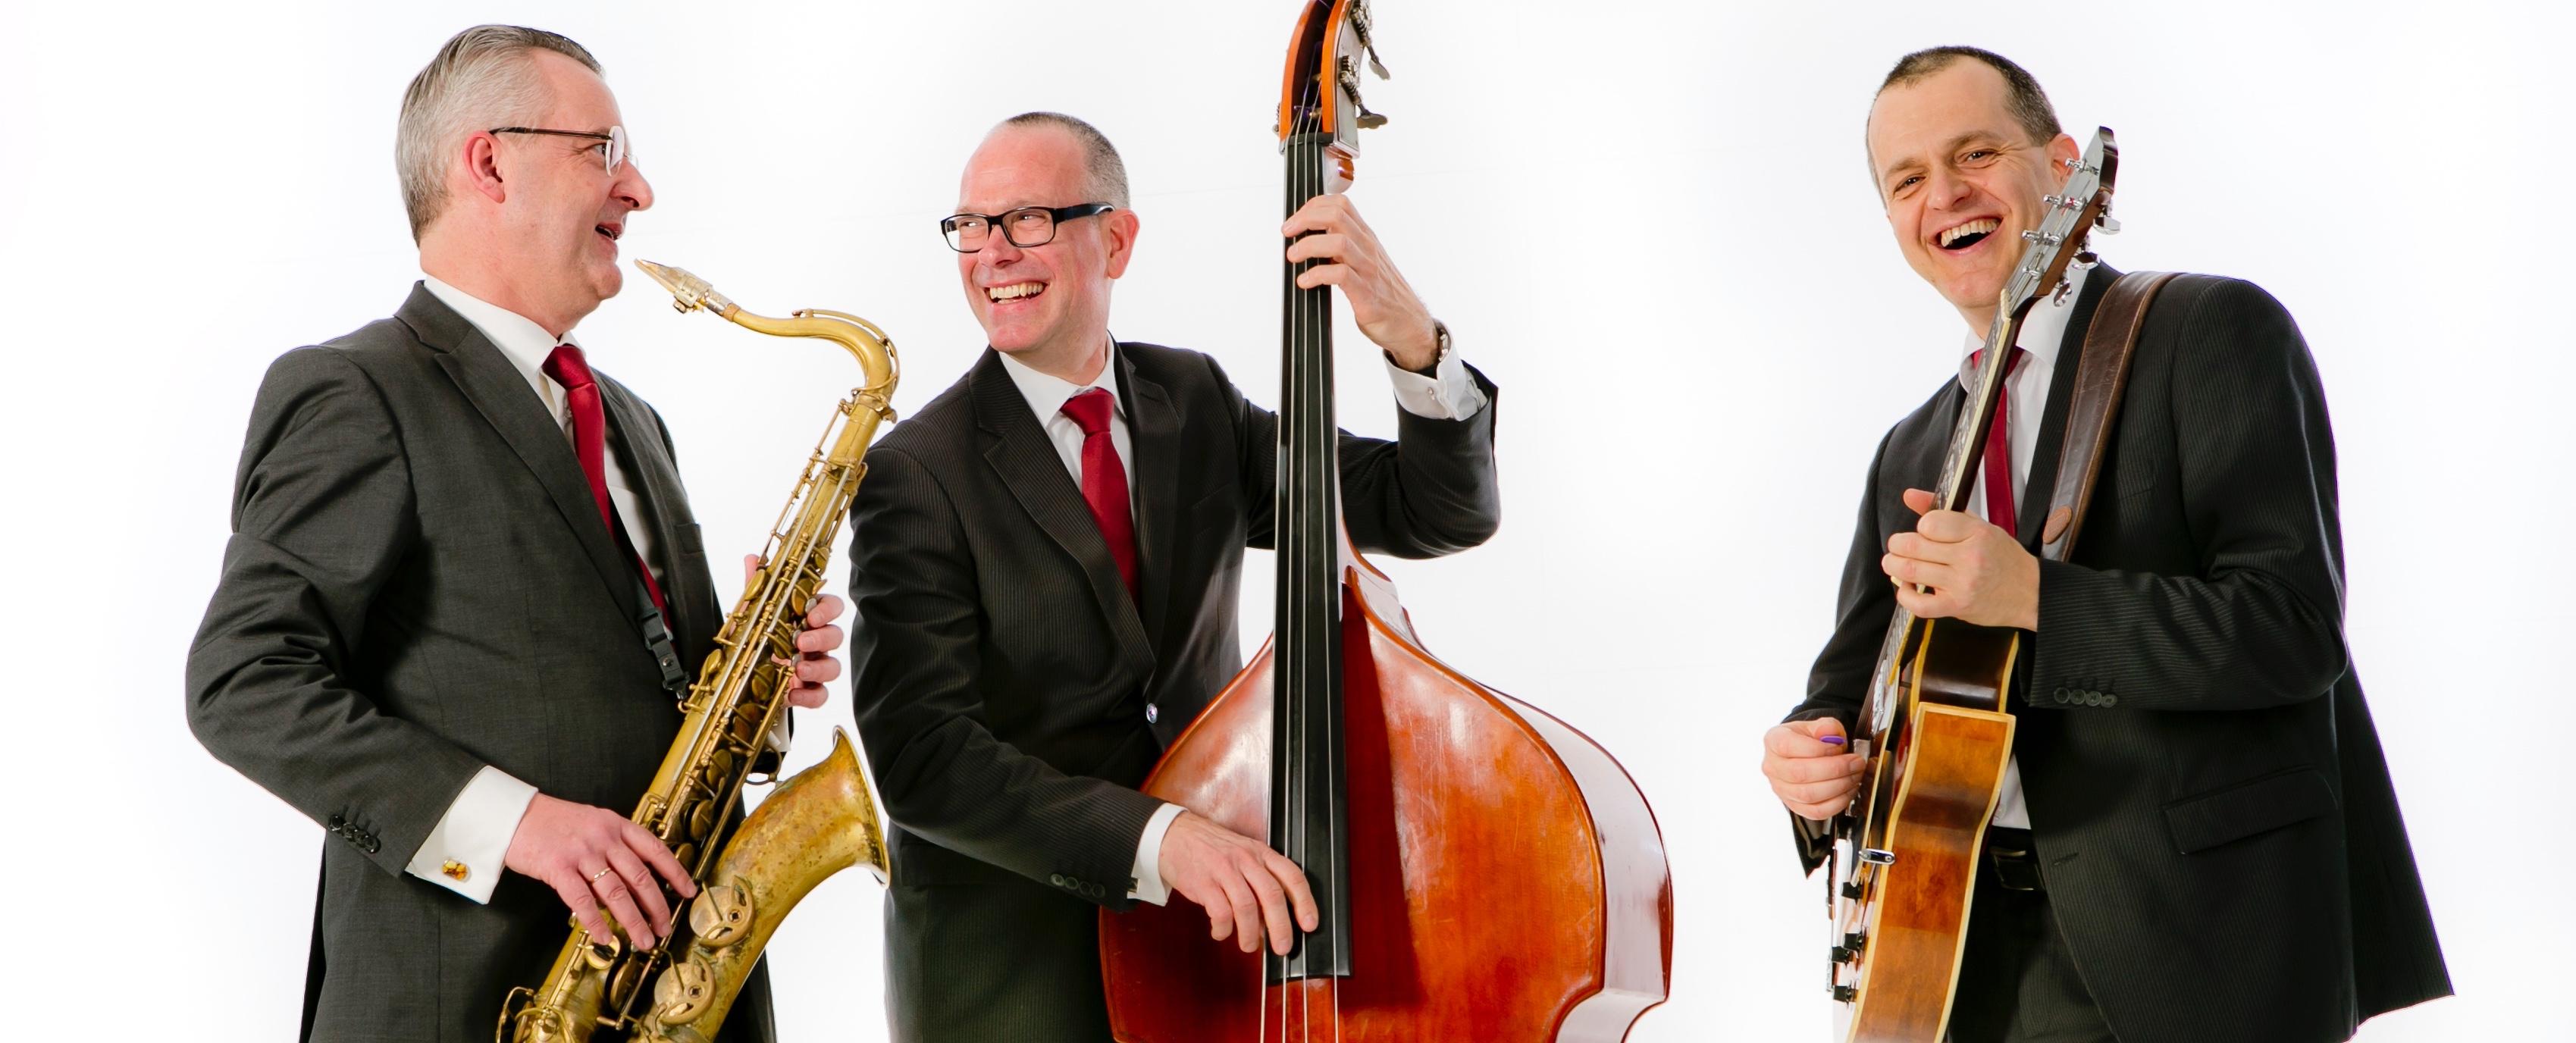 Ascot Jazz Trio | Jazztrio voor Achtergrondmuziek